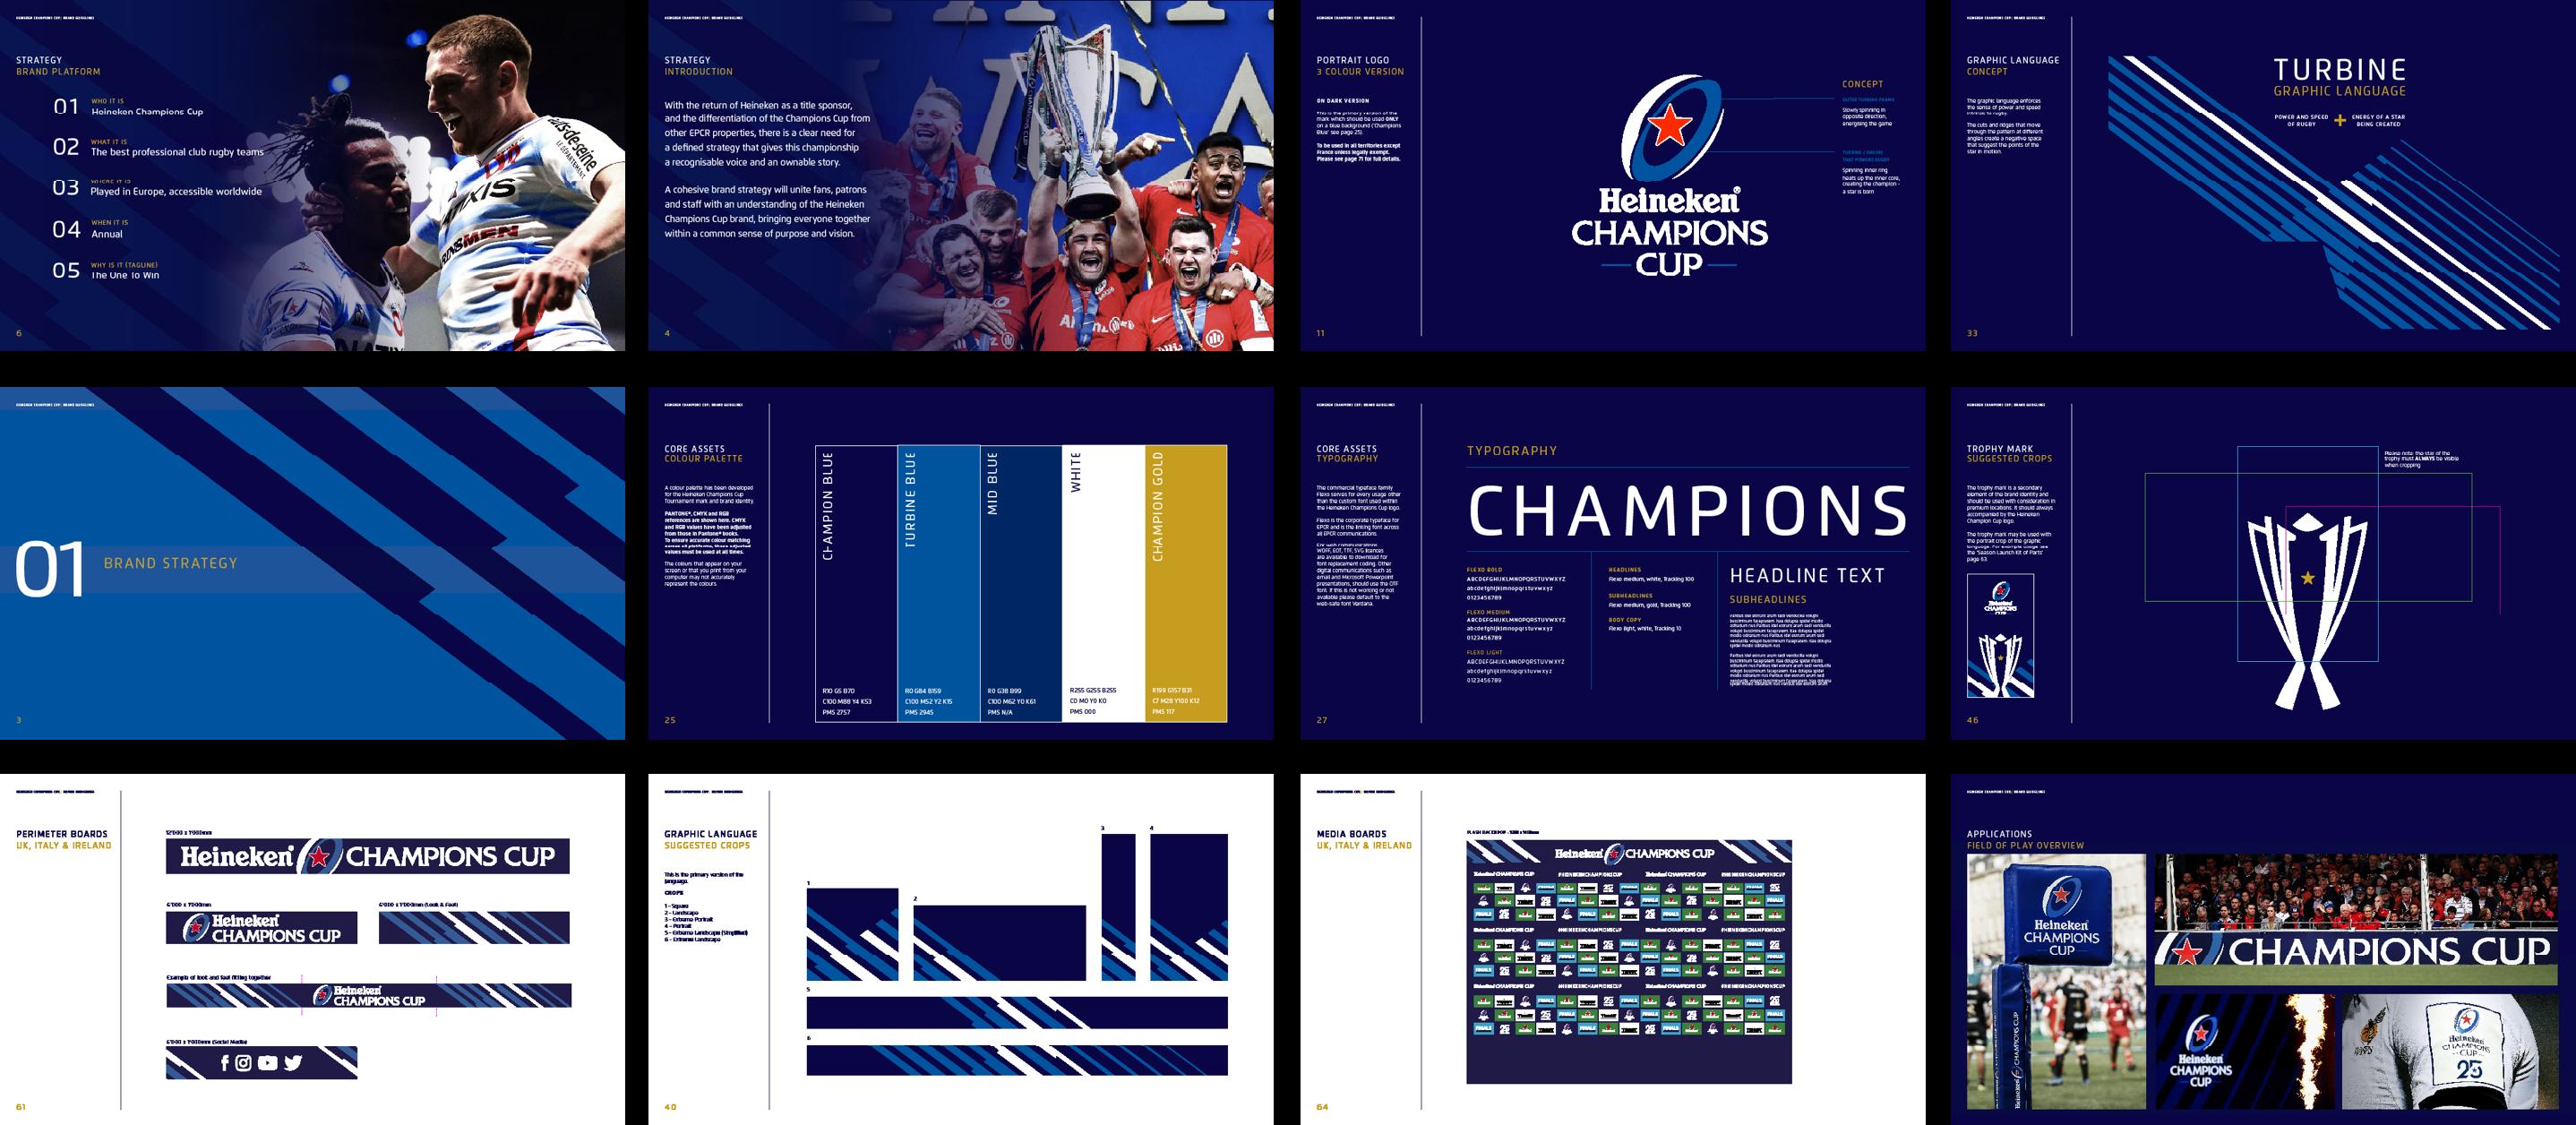 Heineken Champions Cup brand guidelines